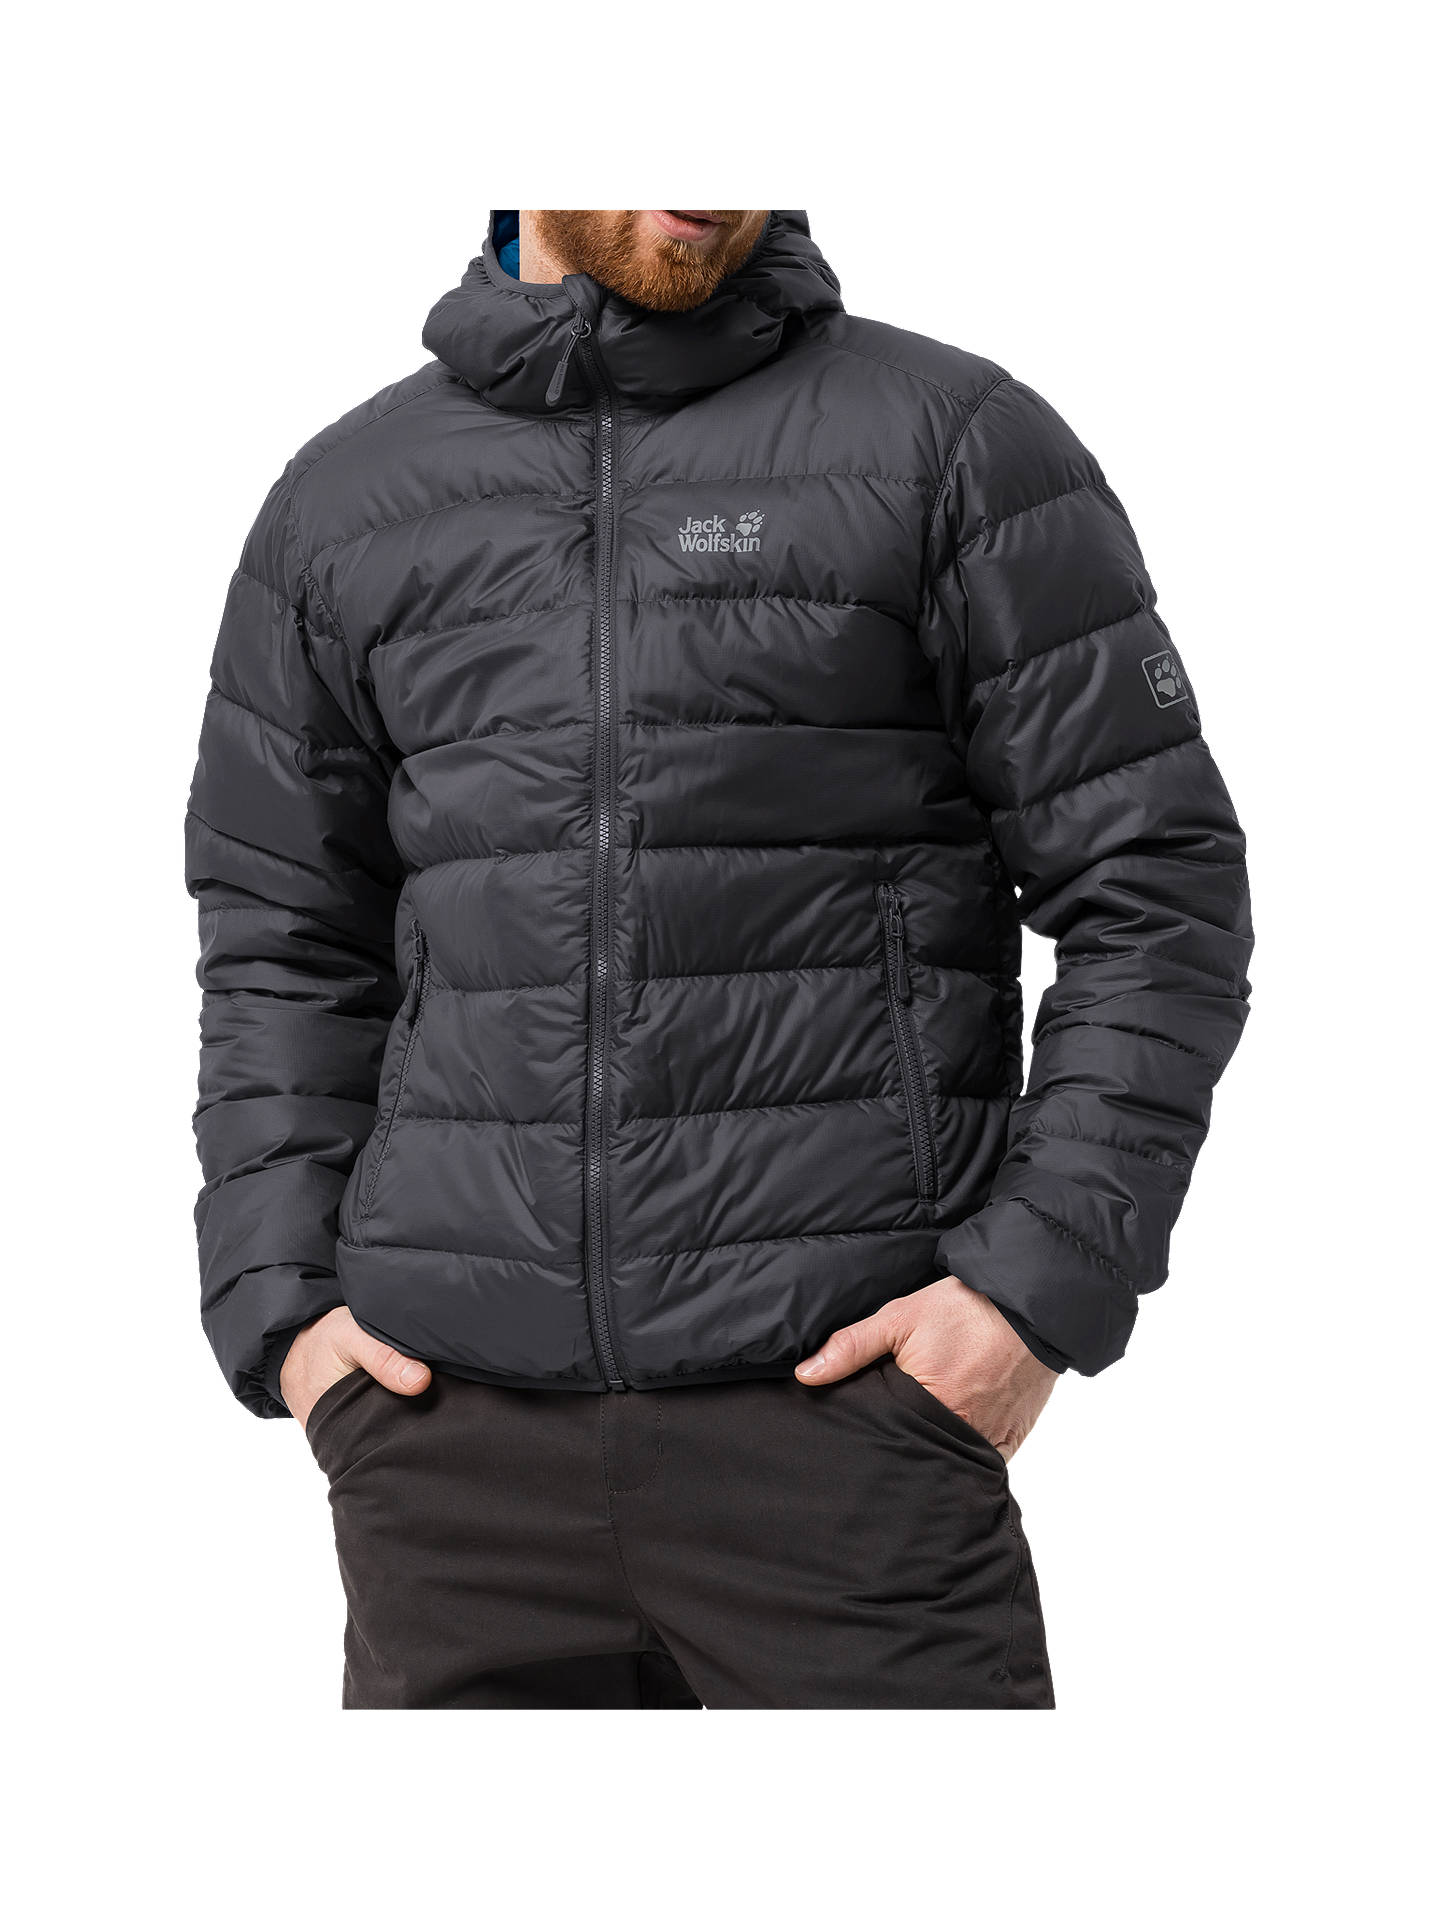 Jack Wolfskin Helium Outdoor Jacket for Women Grey